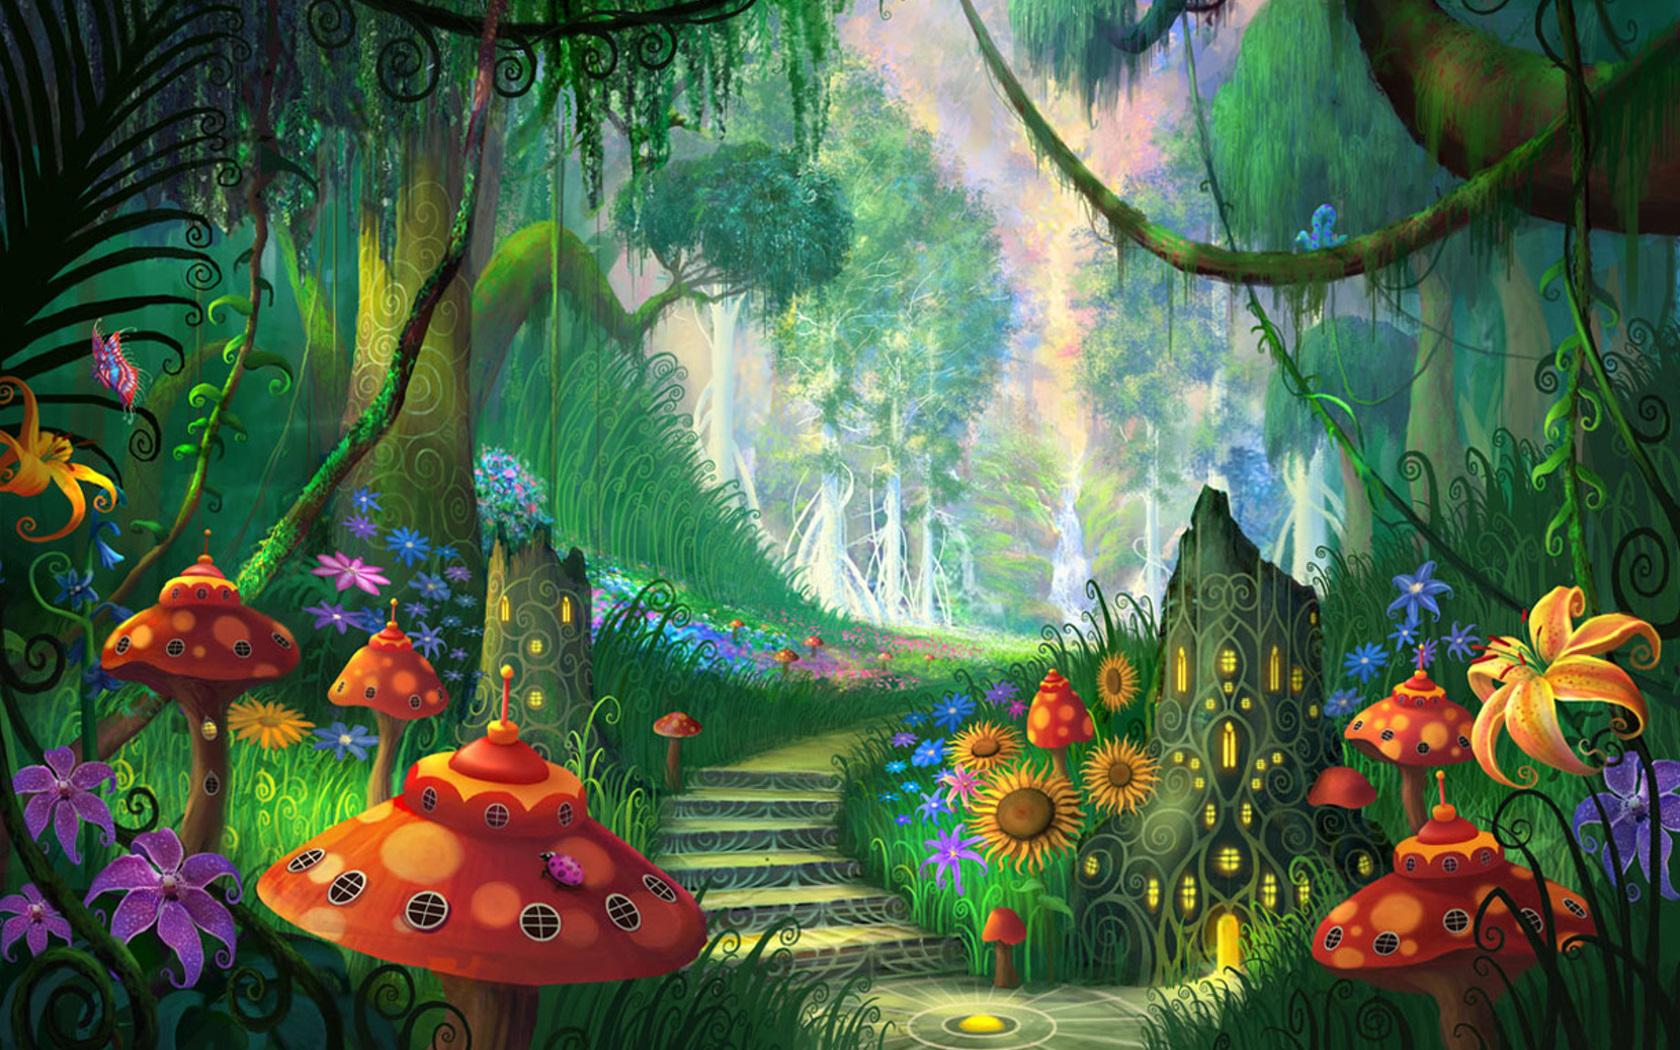 Beautiful Magic Fantasy Garden Wallpaper Gallery Yopriceville 1680x1050